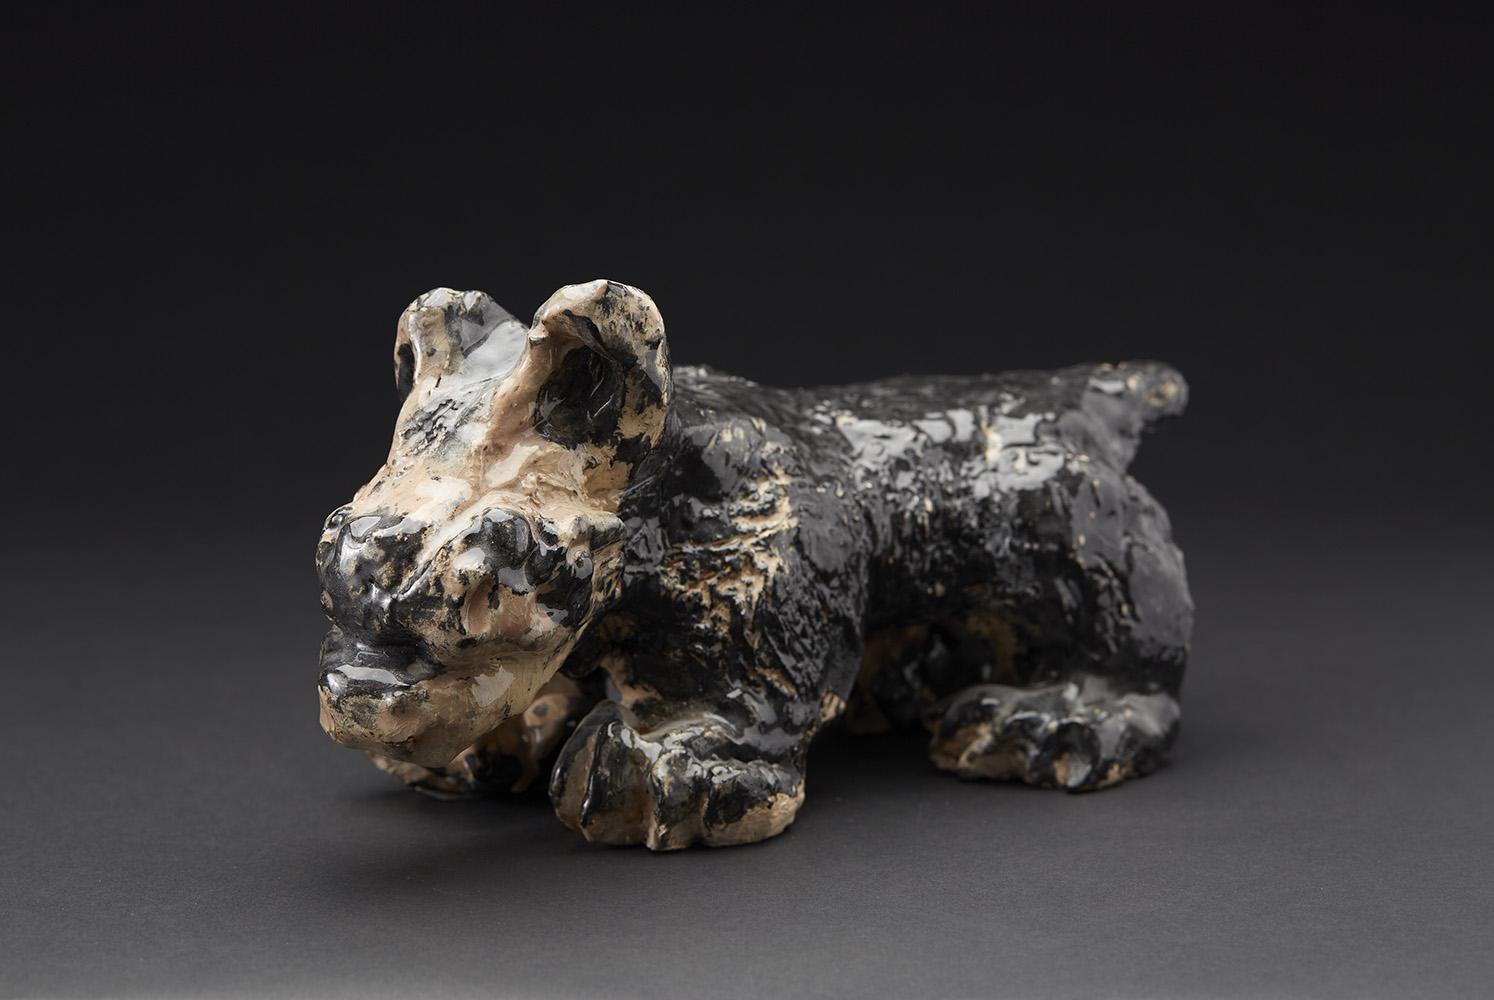 David Parsons    Untitled  , 2015 Ceramic 5 x 4 x 10 inches 12.7 x 10.2 x 25.4 cm DPa 2